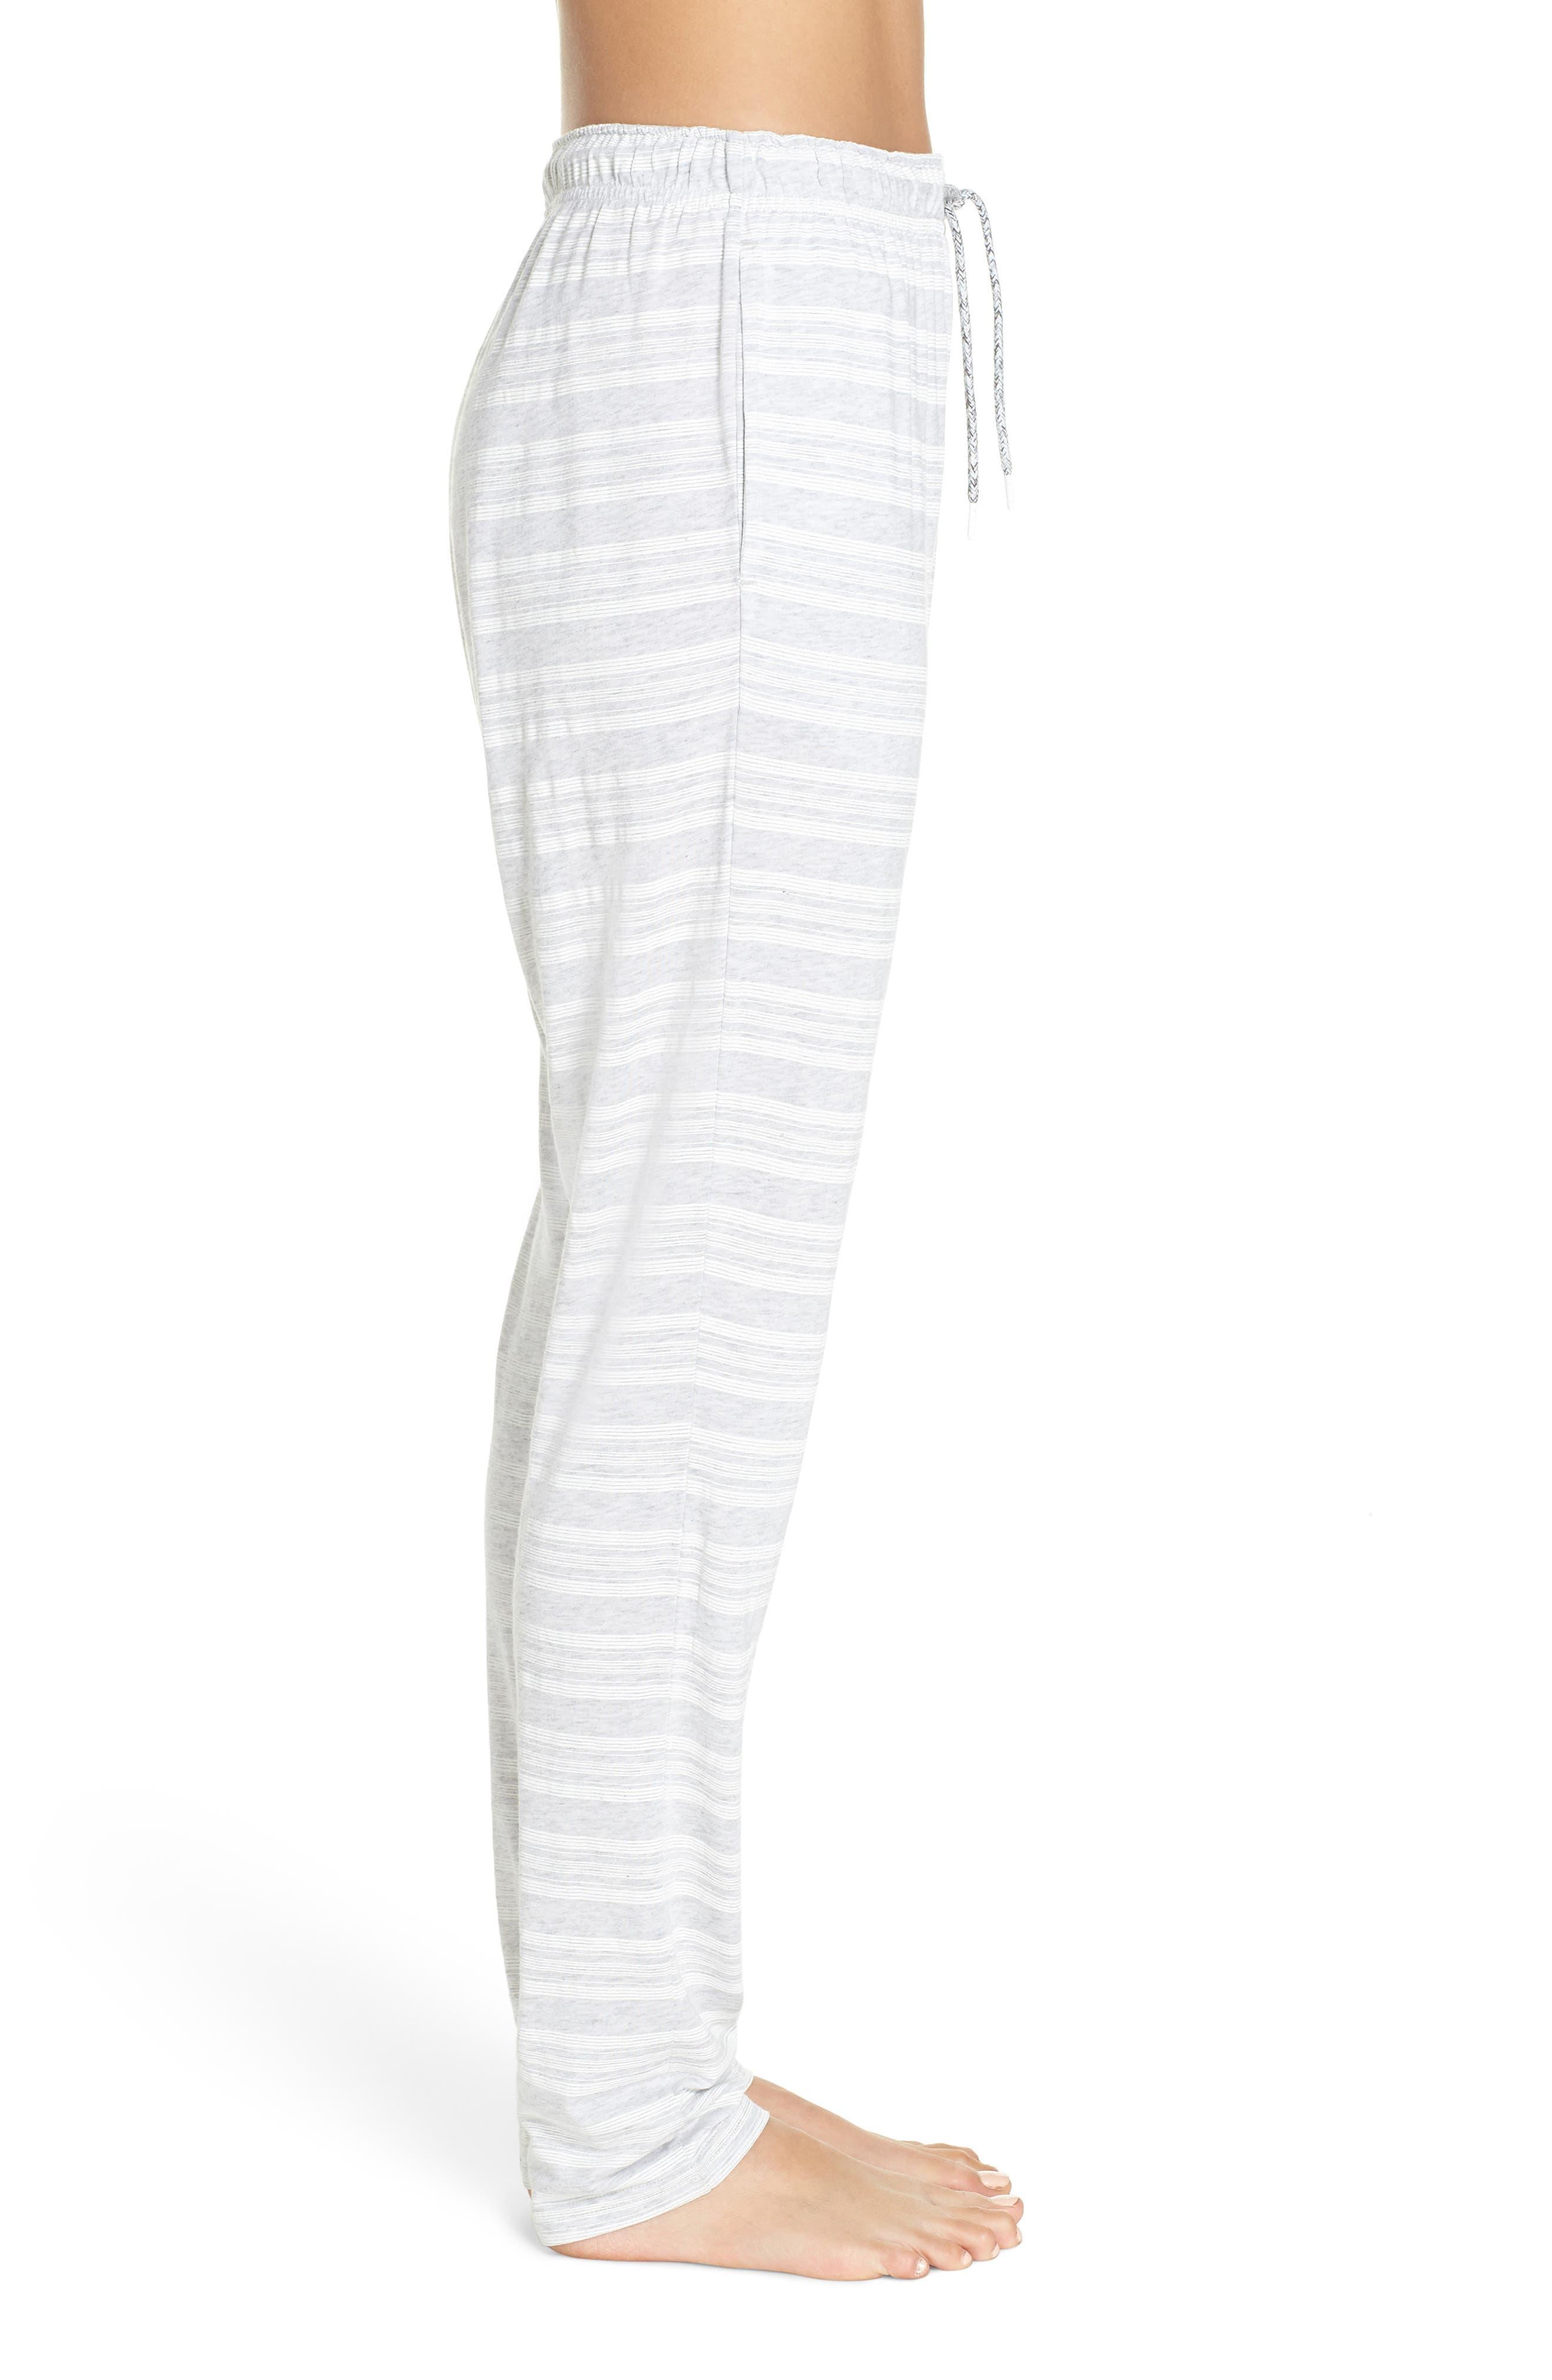 Alice Pajama Pants,                             Alternate thumbnail 3, color,                             LOLLY STRIPE WHITE